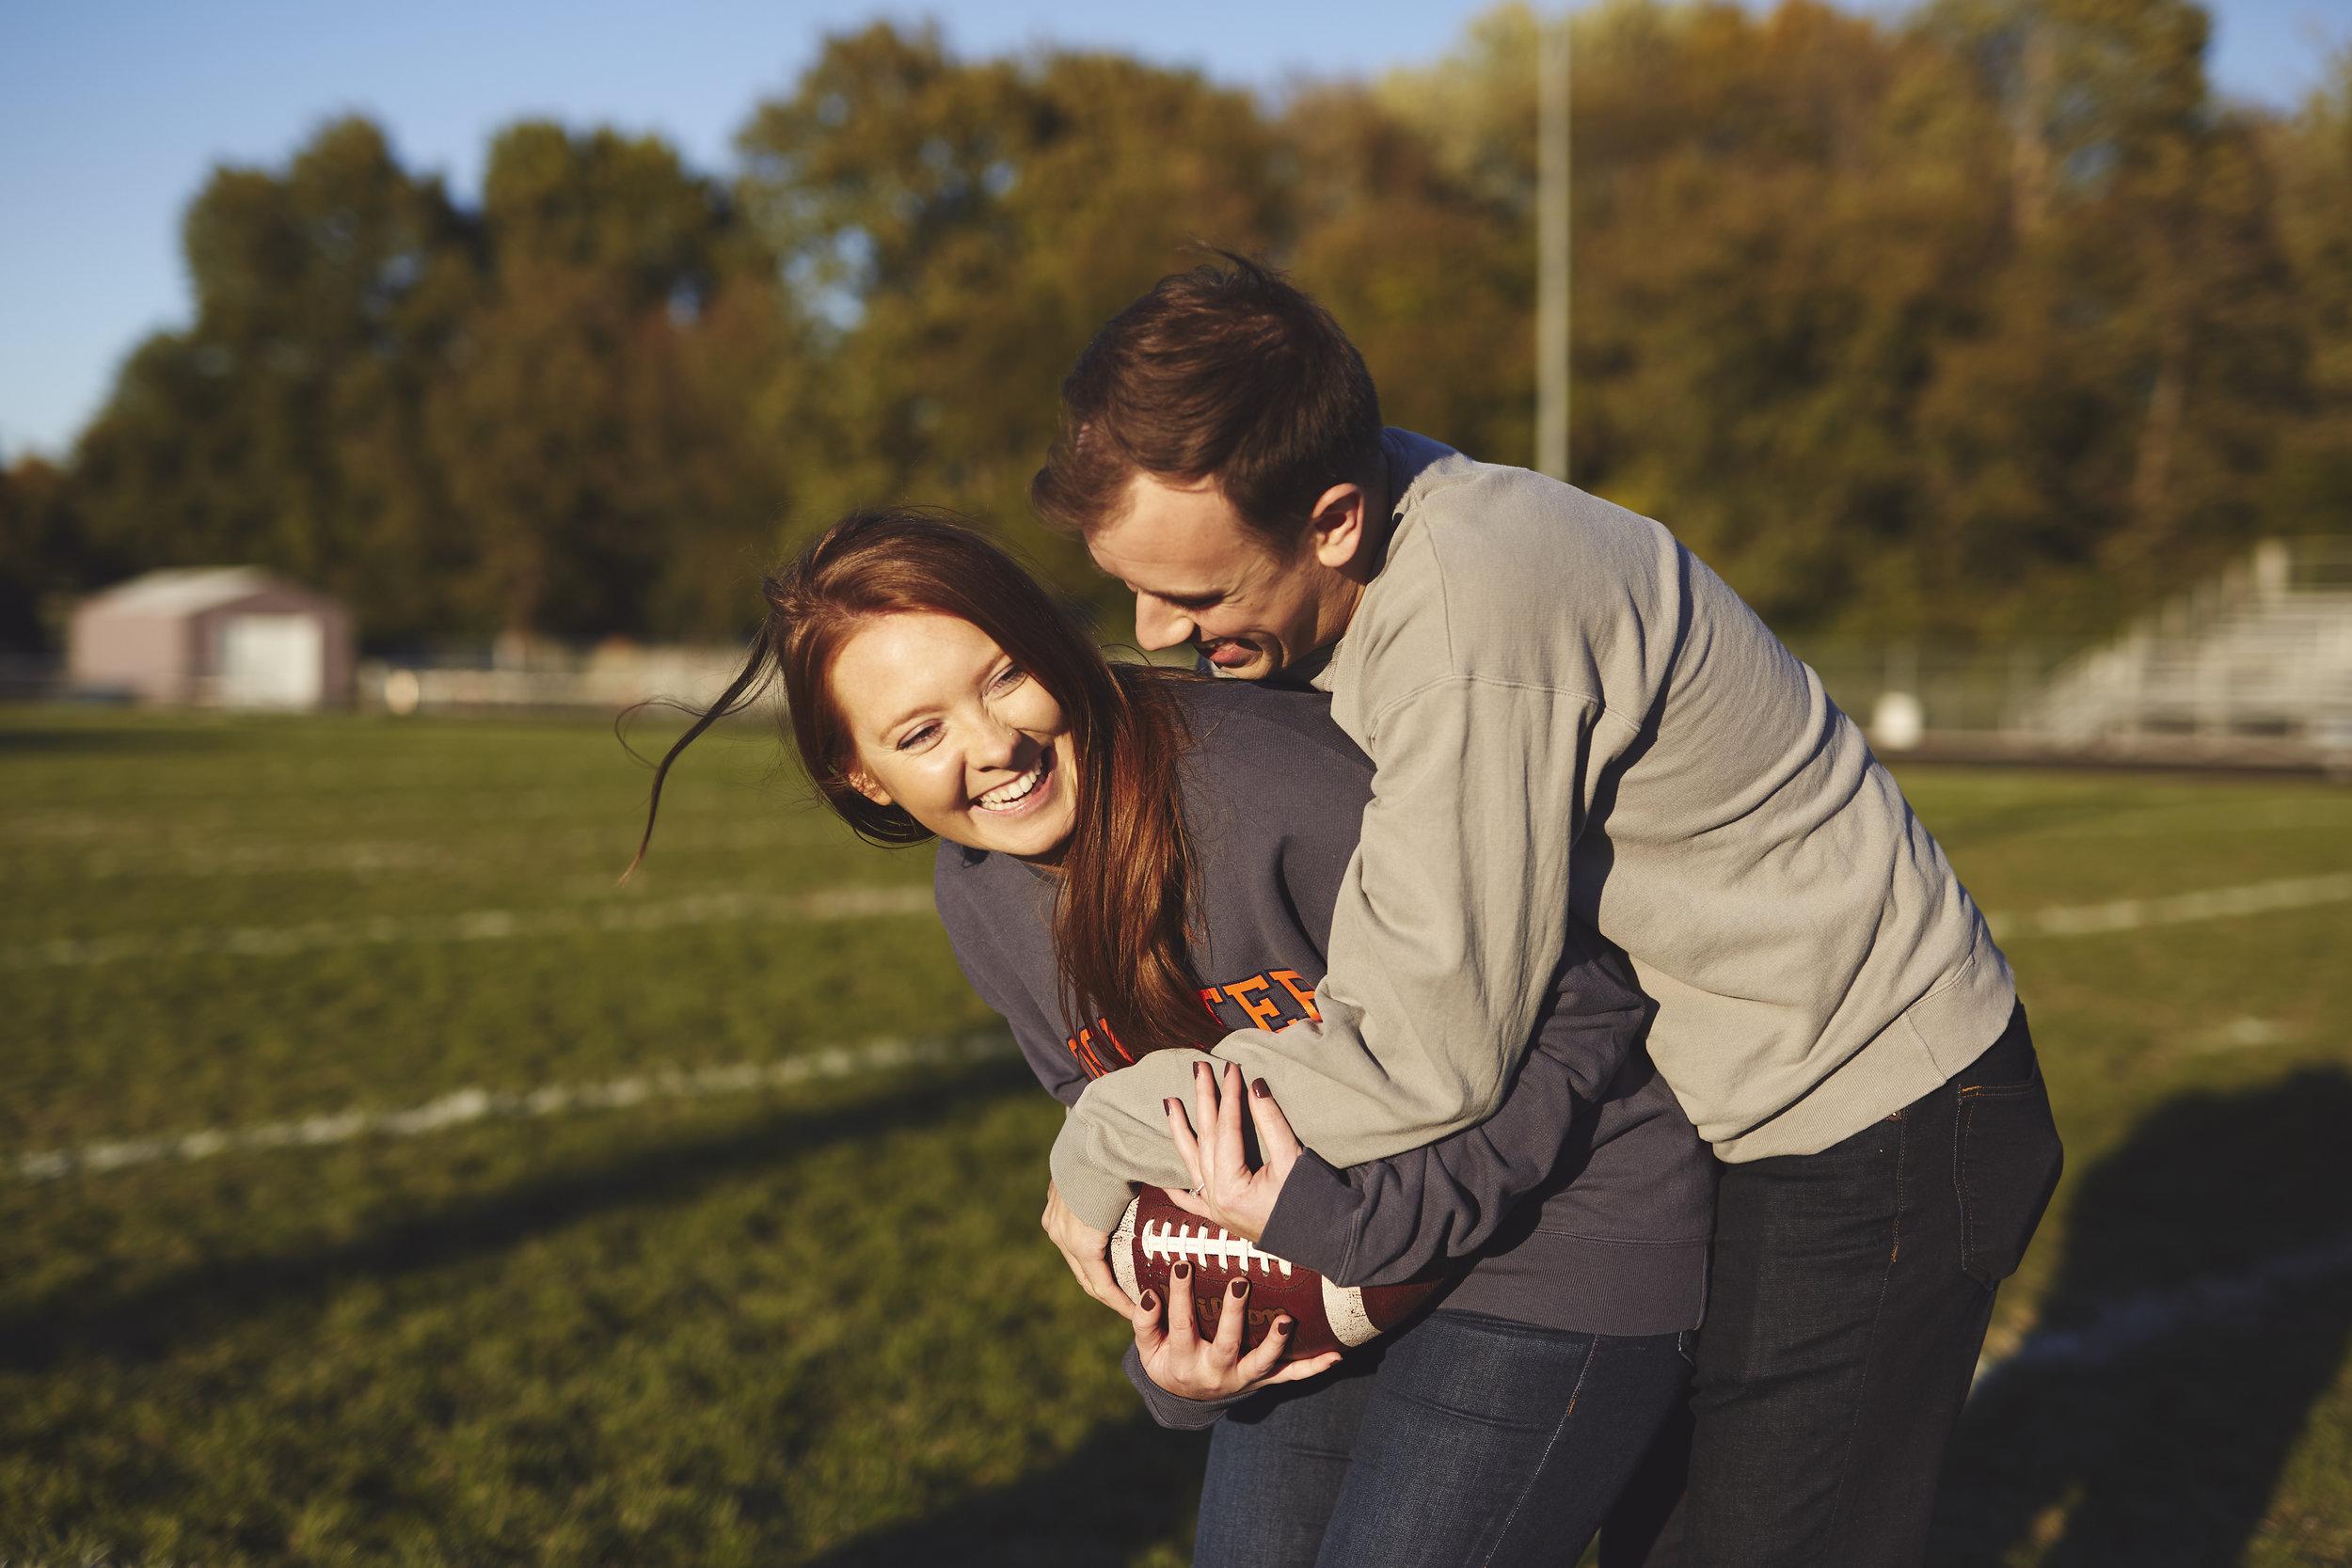 Troy & Kathleen - benromangphoto - 6I5A0762.jpg